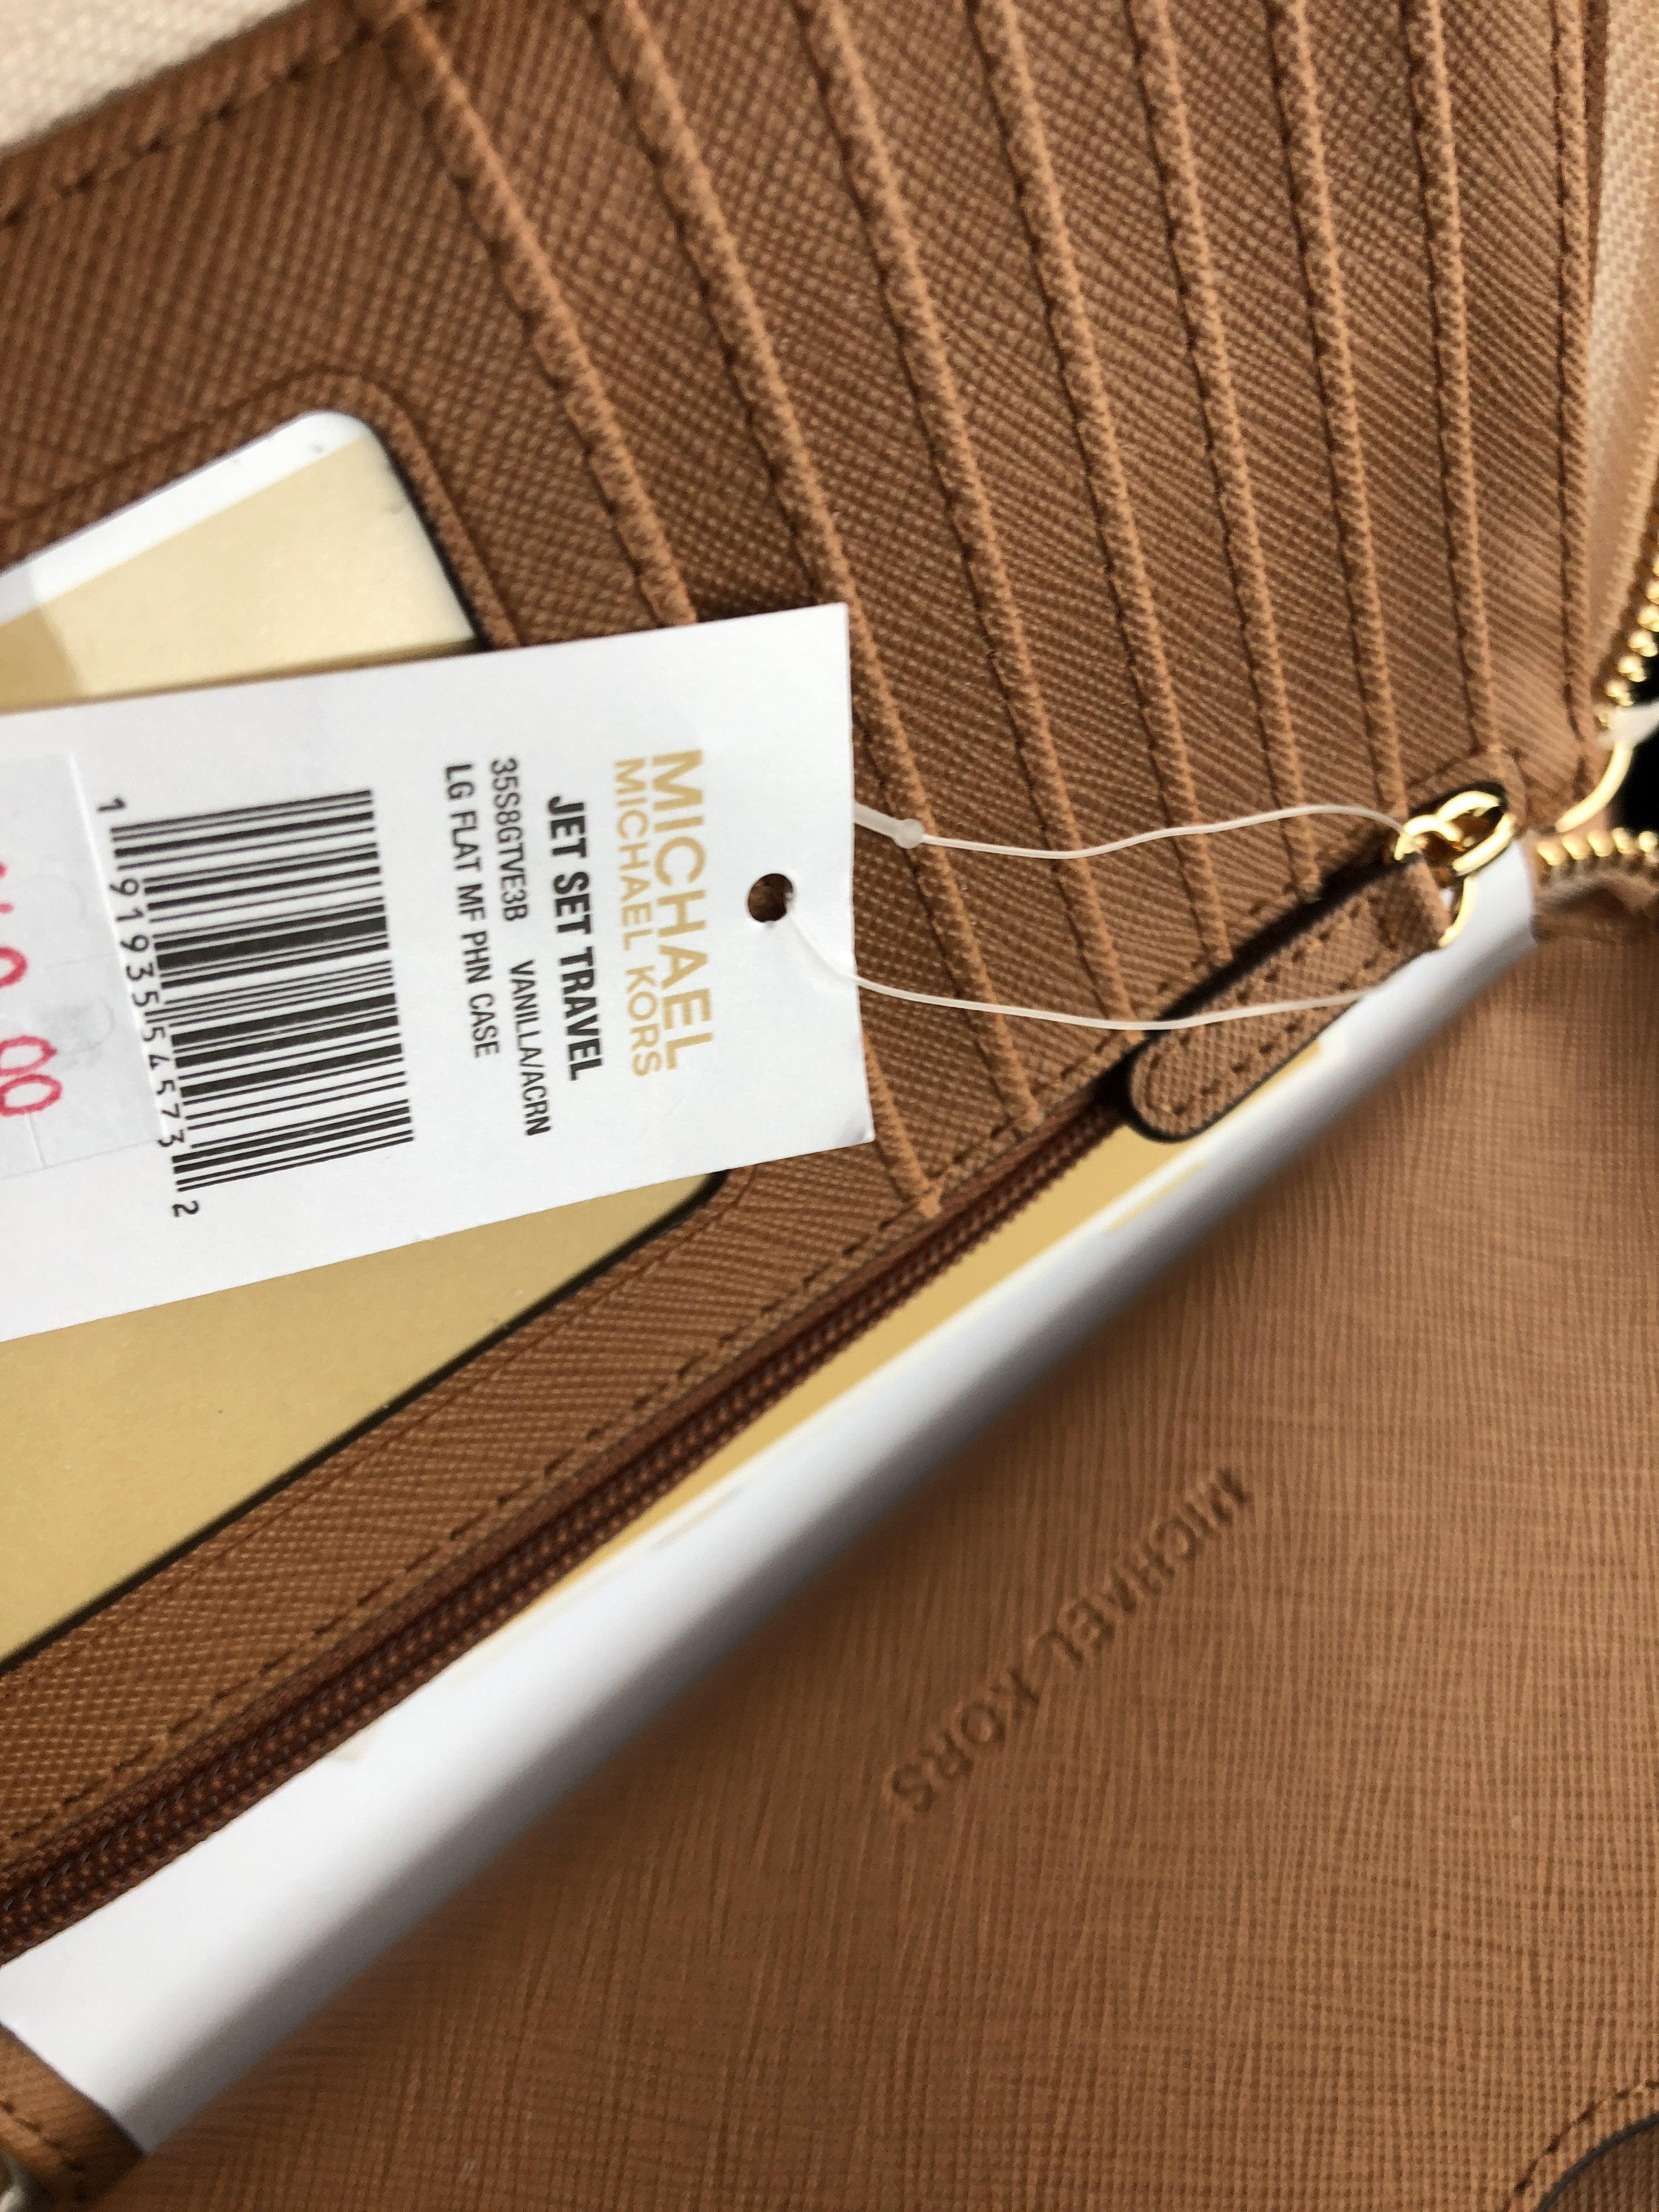 22f3b3e8fd6390 Michael Kors - Michael Kors Jet Set Phone Wristlet Wallet Vanilla MK Acorn  - Walmart.com